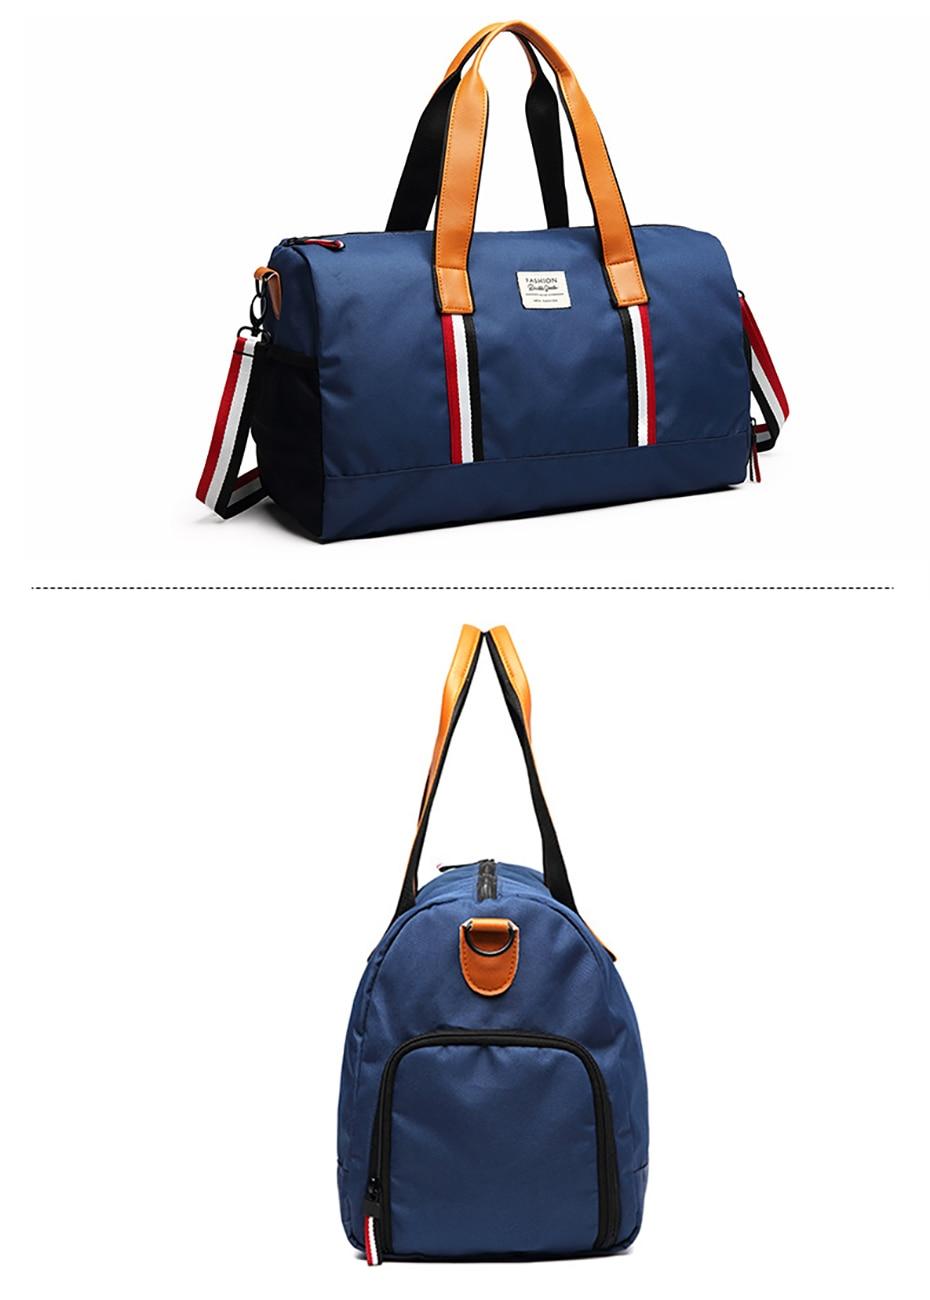 Fitness Gym Sport Bags Men and Women Waterproof Sports Handbag Outdoor Travel Camping Multi-function Bag10